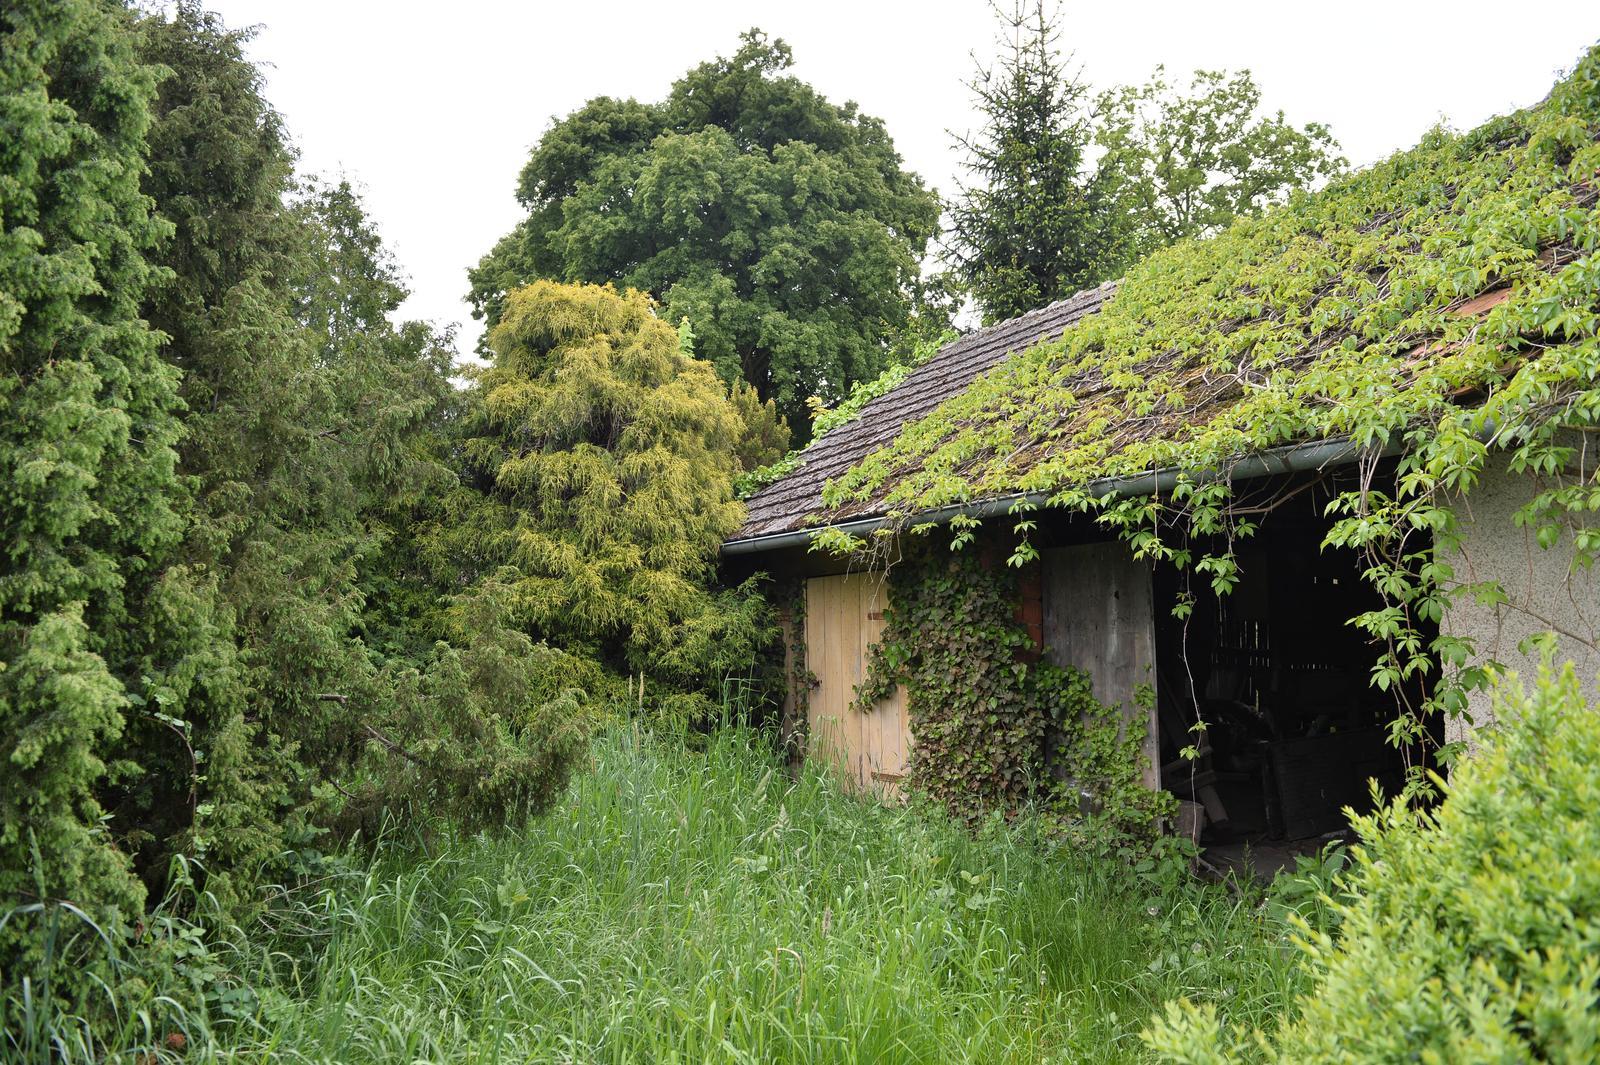 ..our rustic cottage.. - ..naše džungle :-D